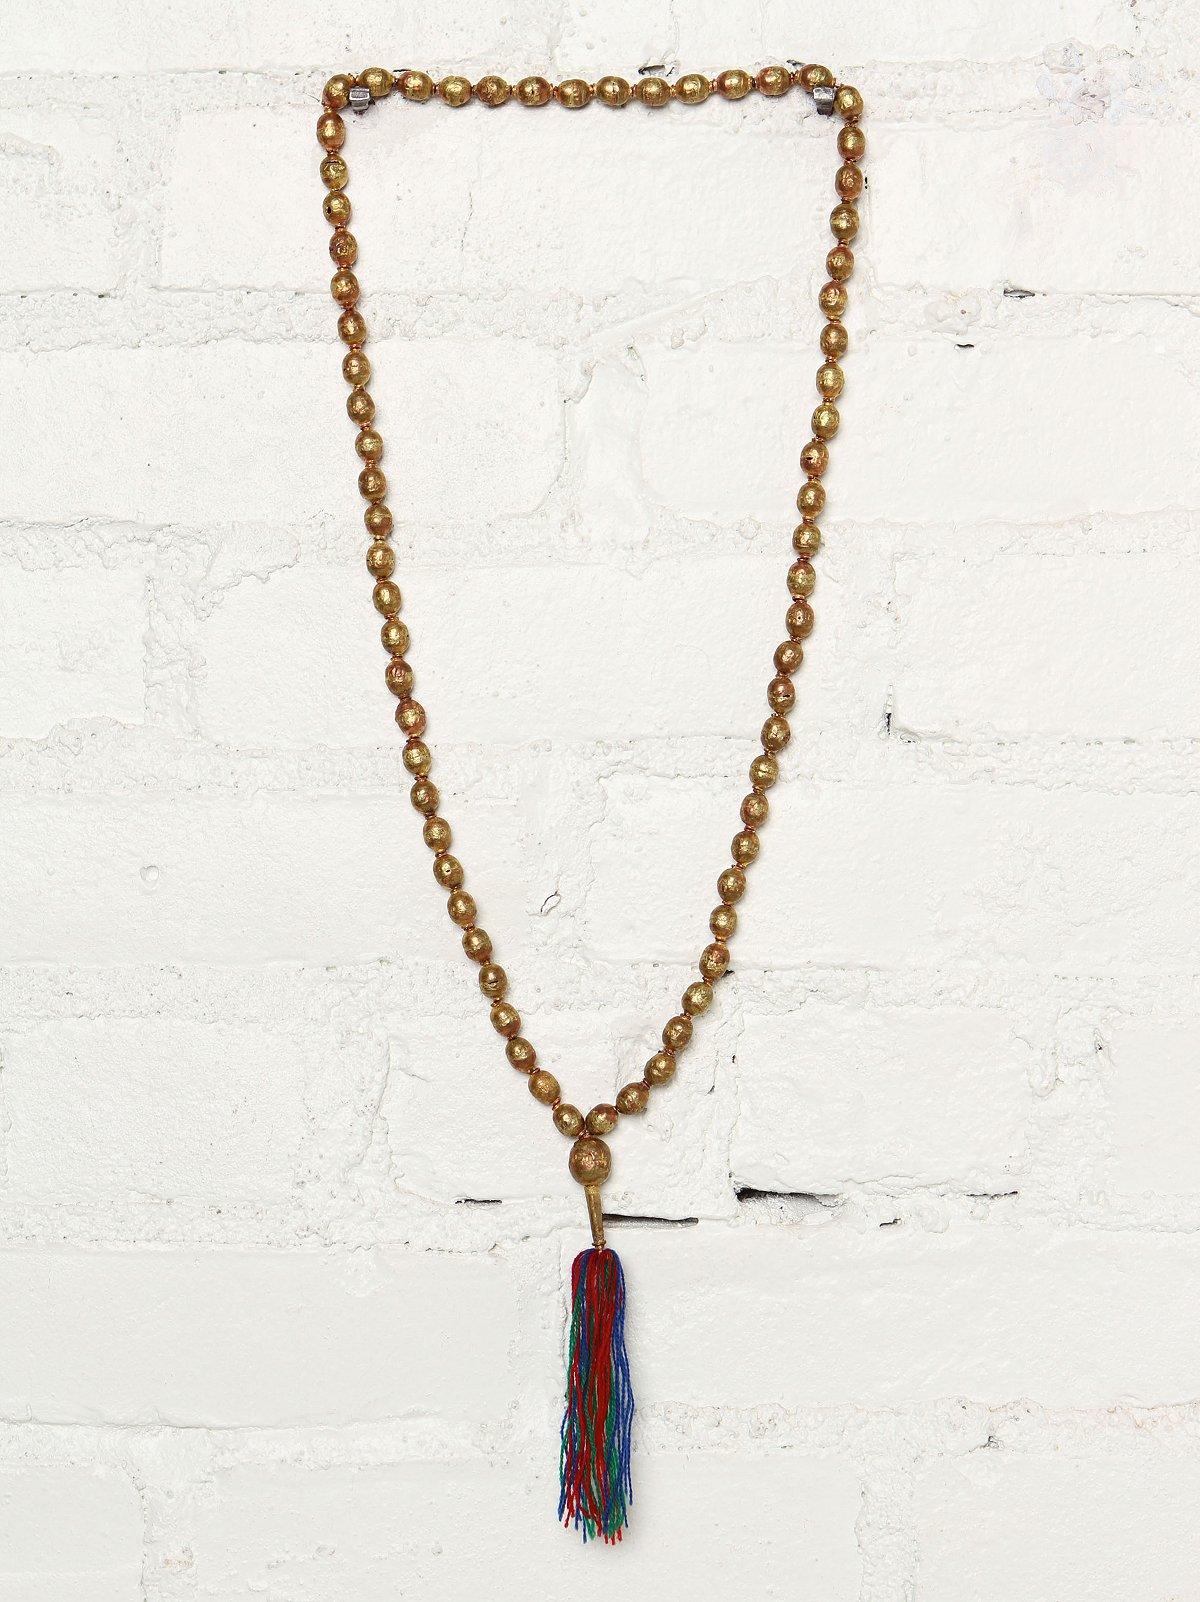 Vintage Indian Beads